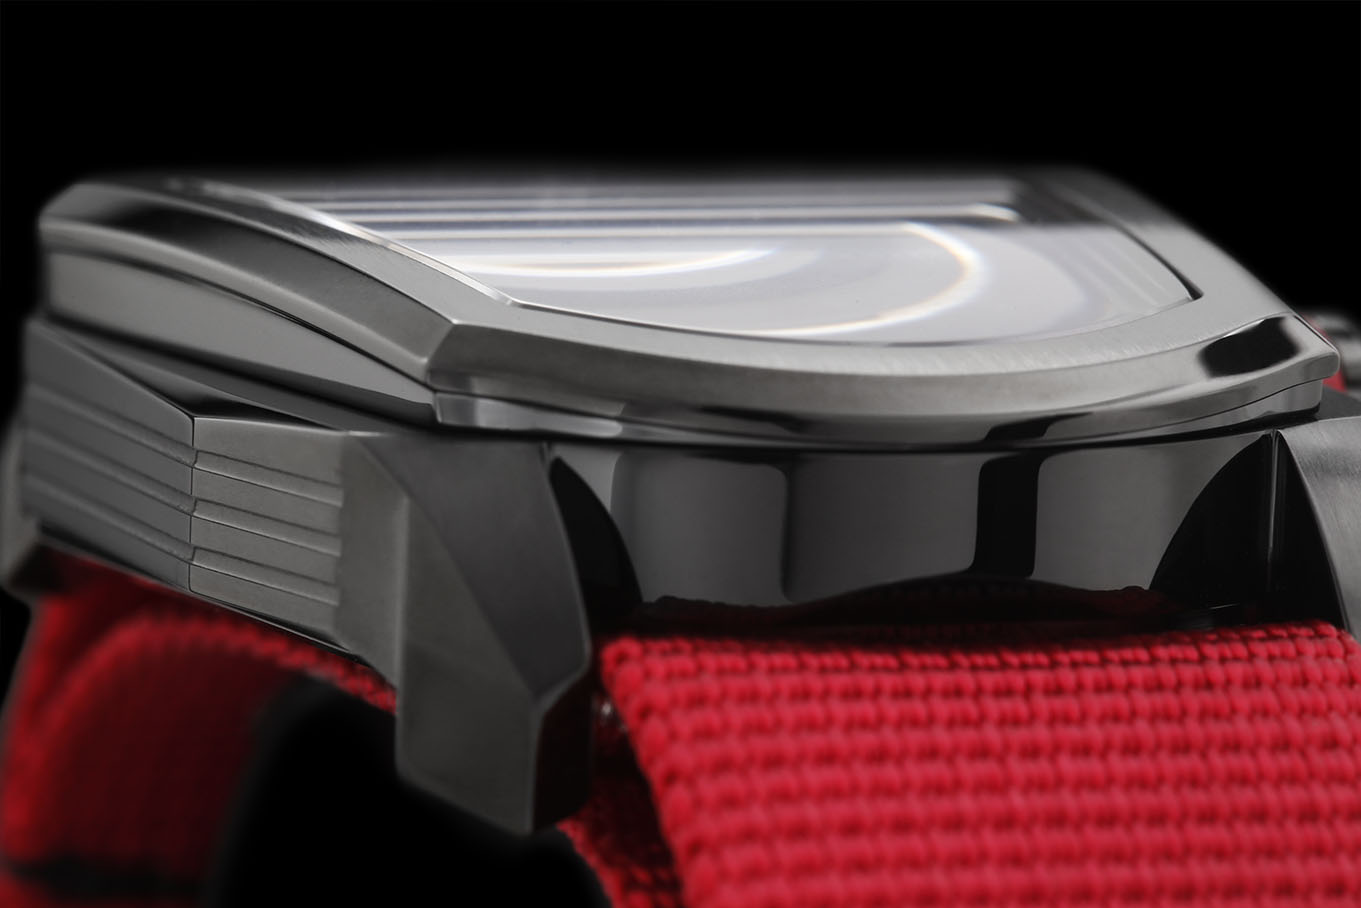 PHTW402 Phantoms inferno Spectrum miyota automatic mechanical watch